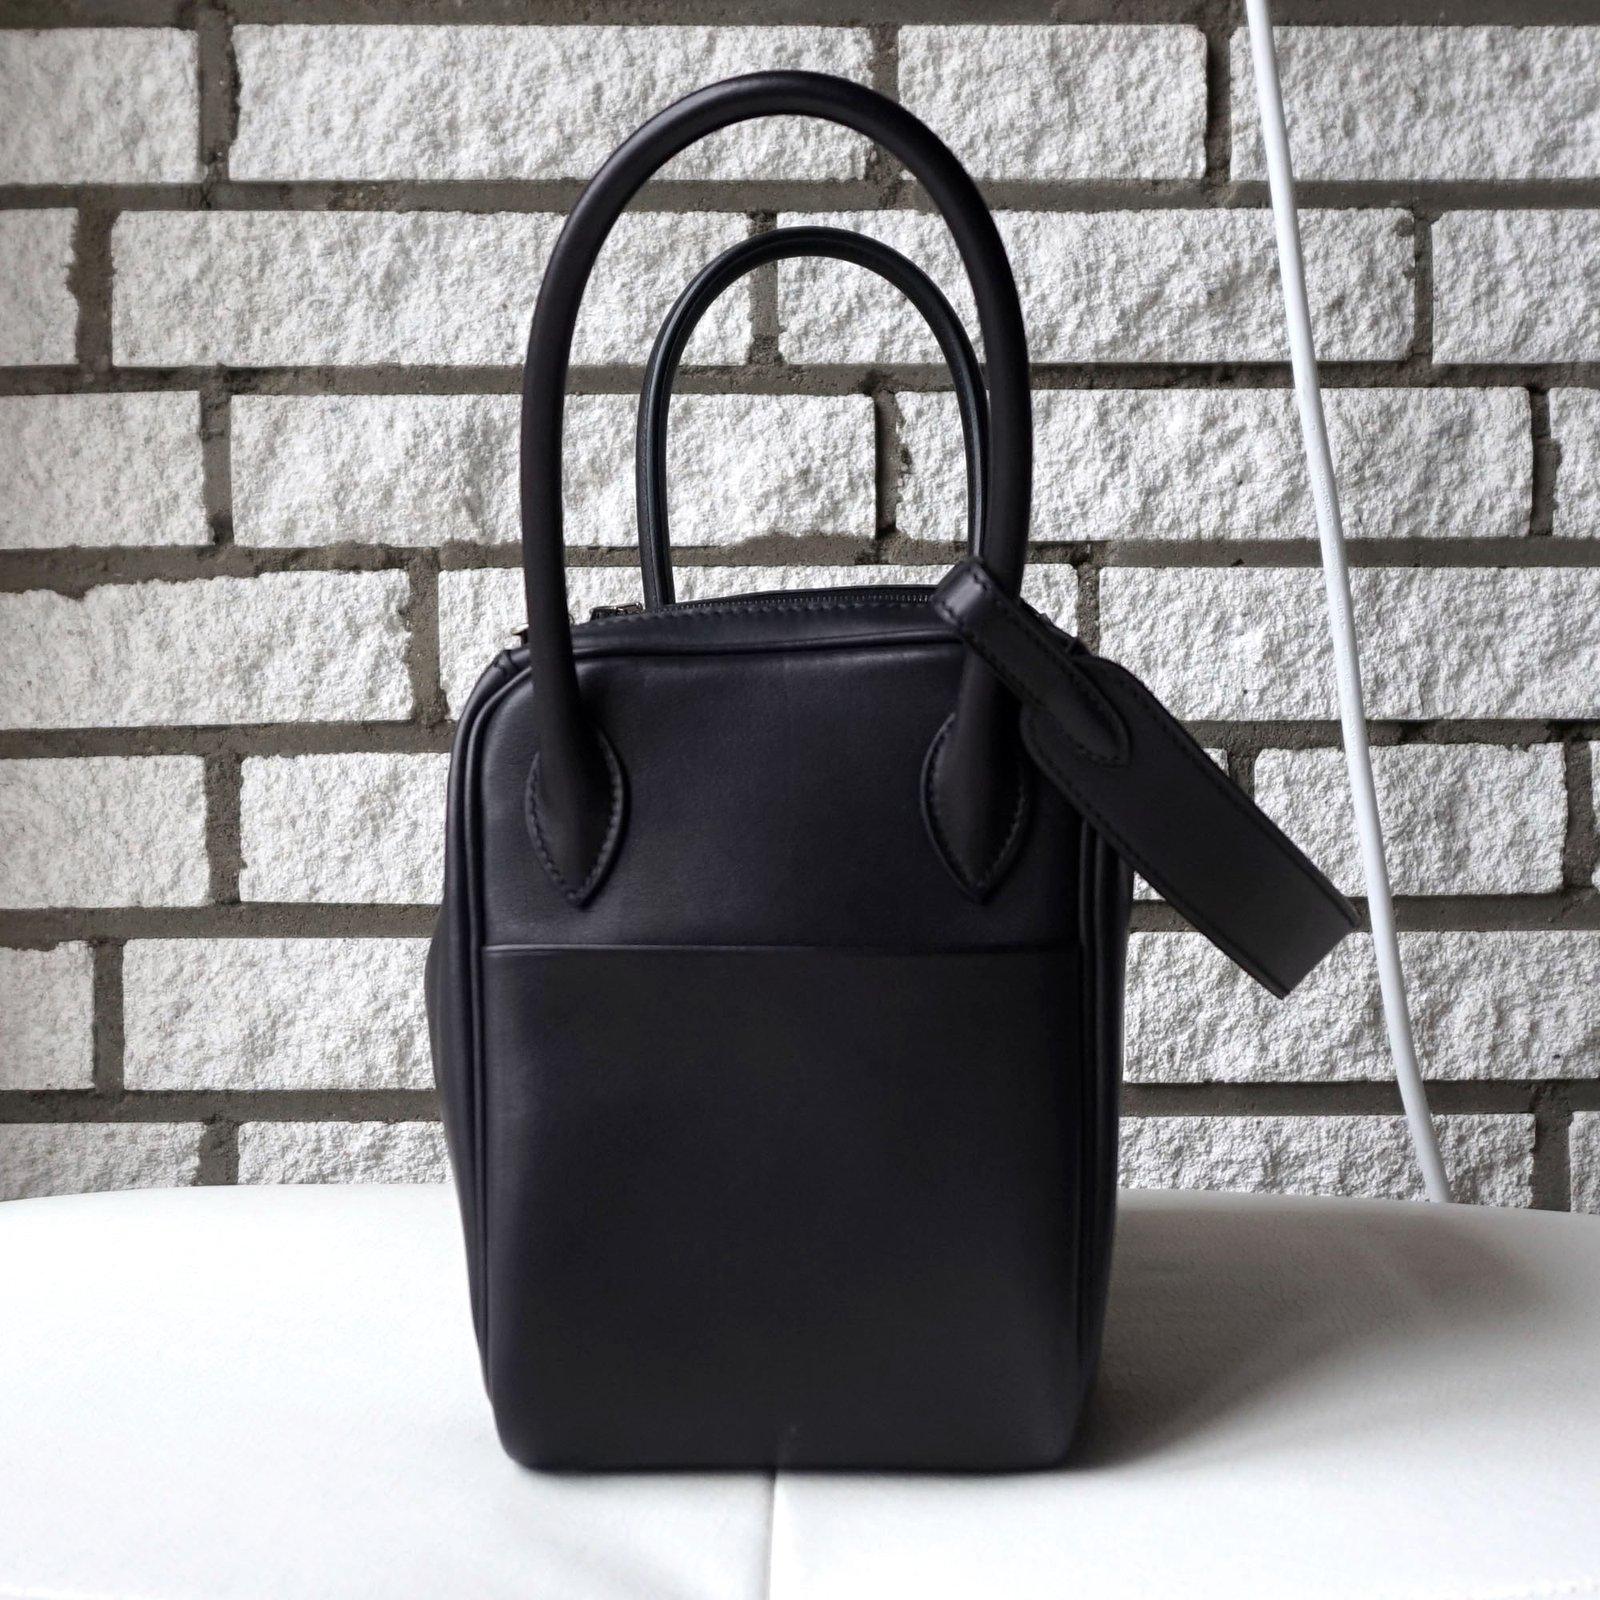 669f0b948975 ... clearance hermès lindy 26 handbags leather black ref.46305 joli closet  6aa18 eb6c9